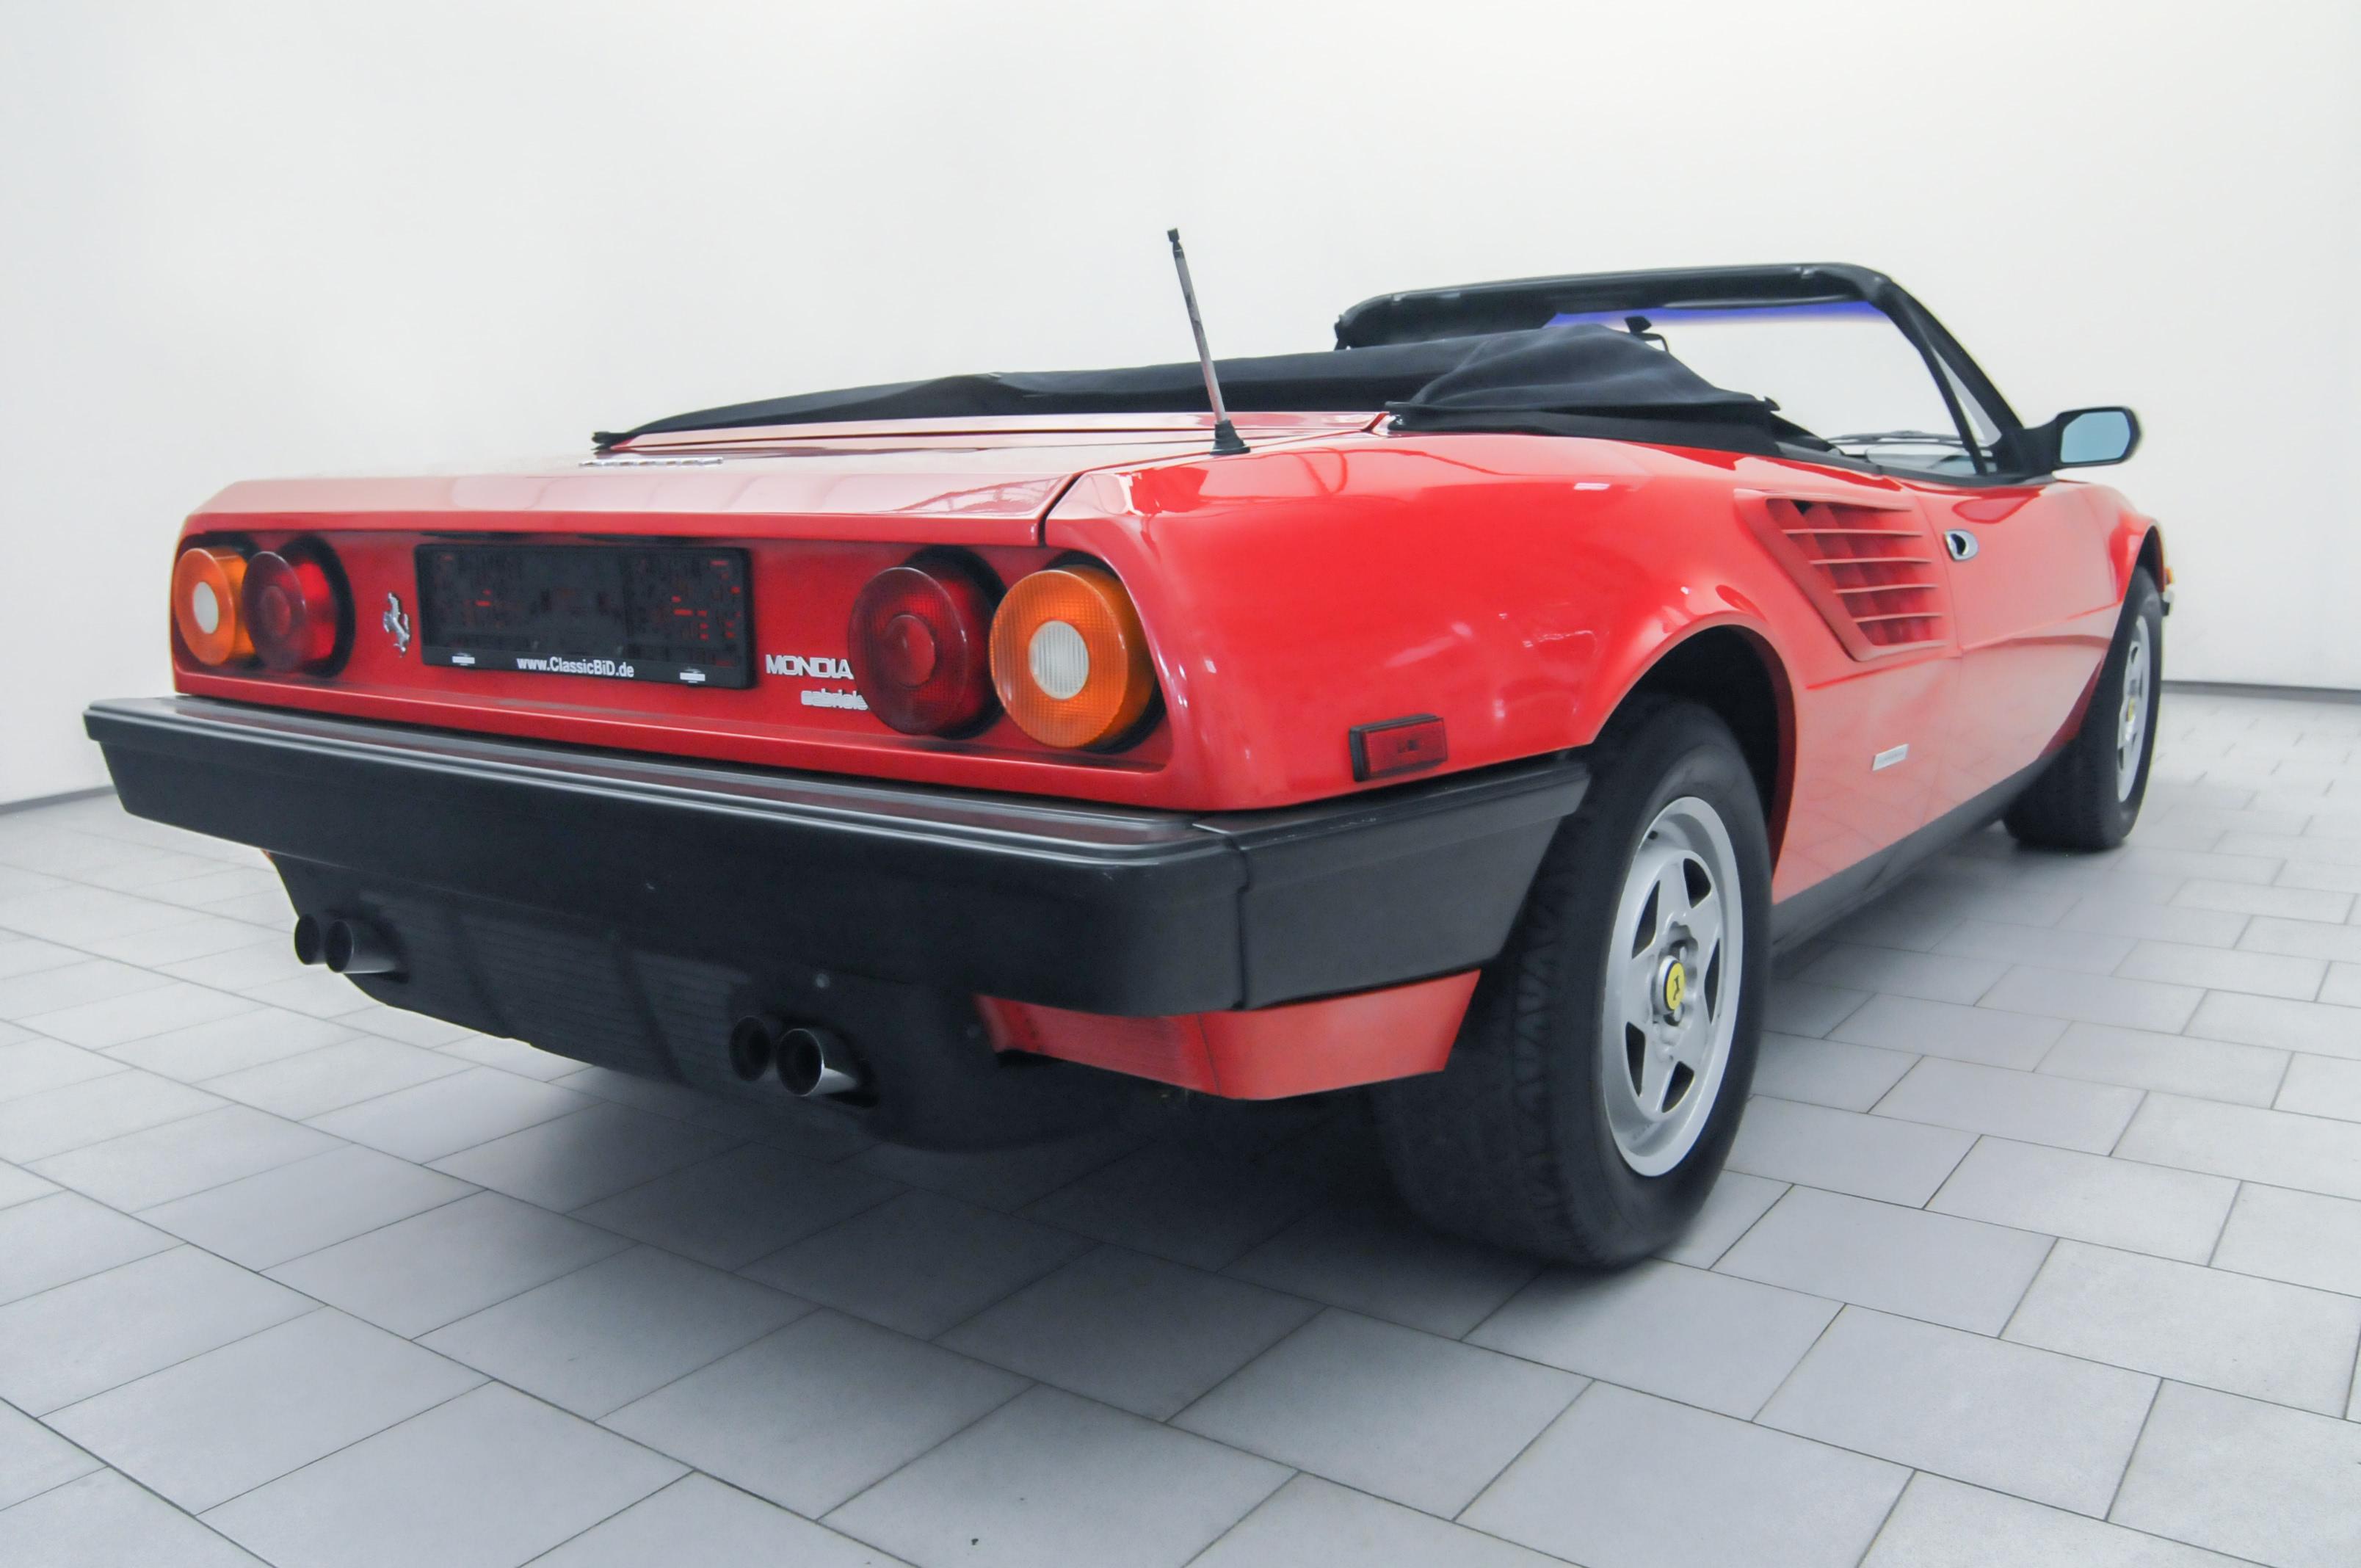 OT0119_08 Gorgeous Ferrari Mondial 3.2 Cabriolet V8 Quattrovalvole Cars Trend